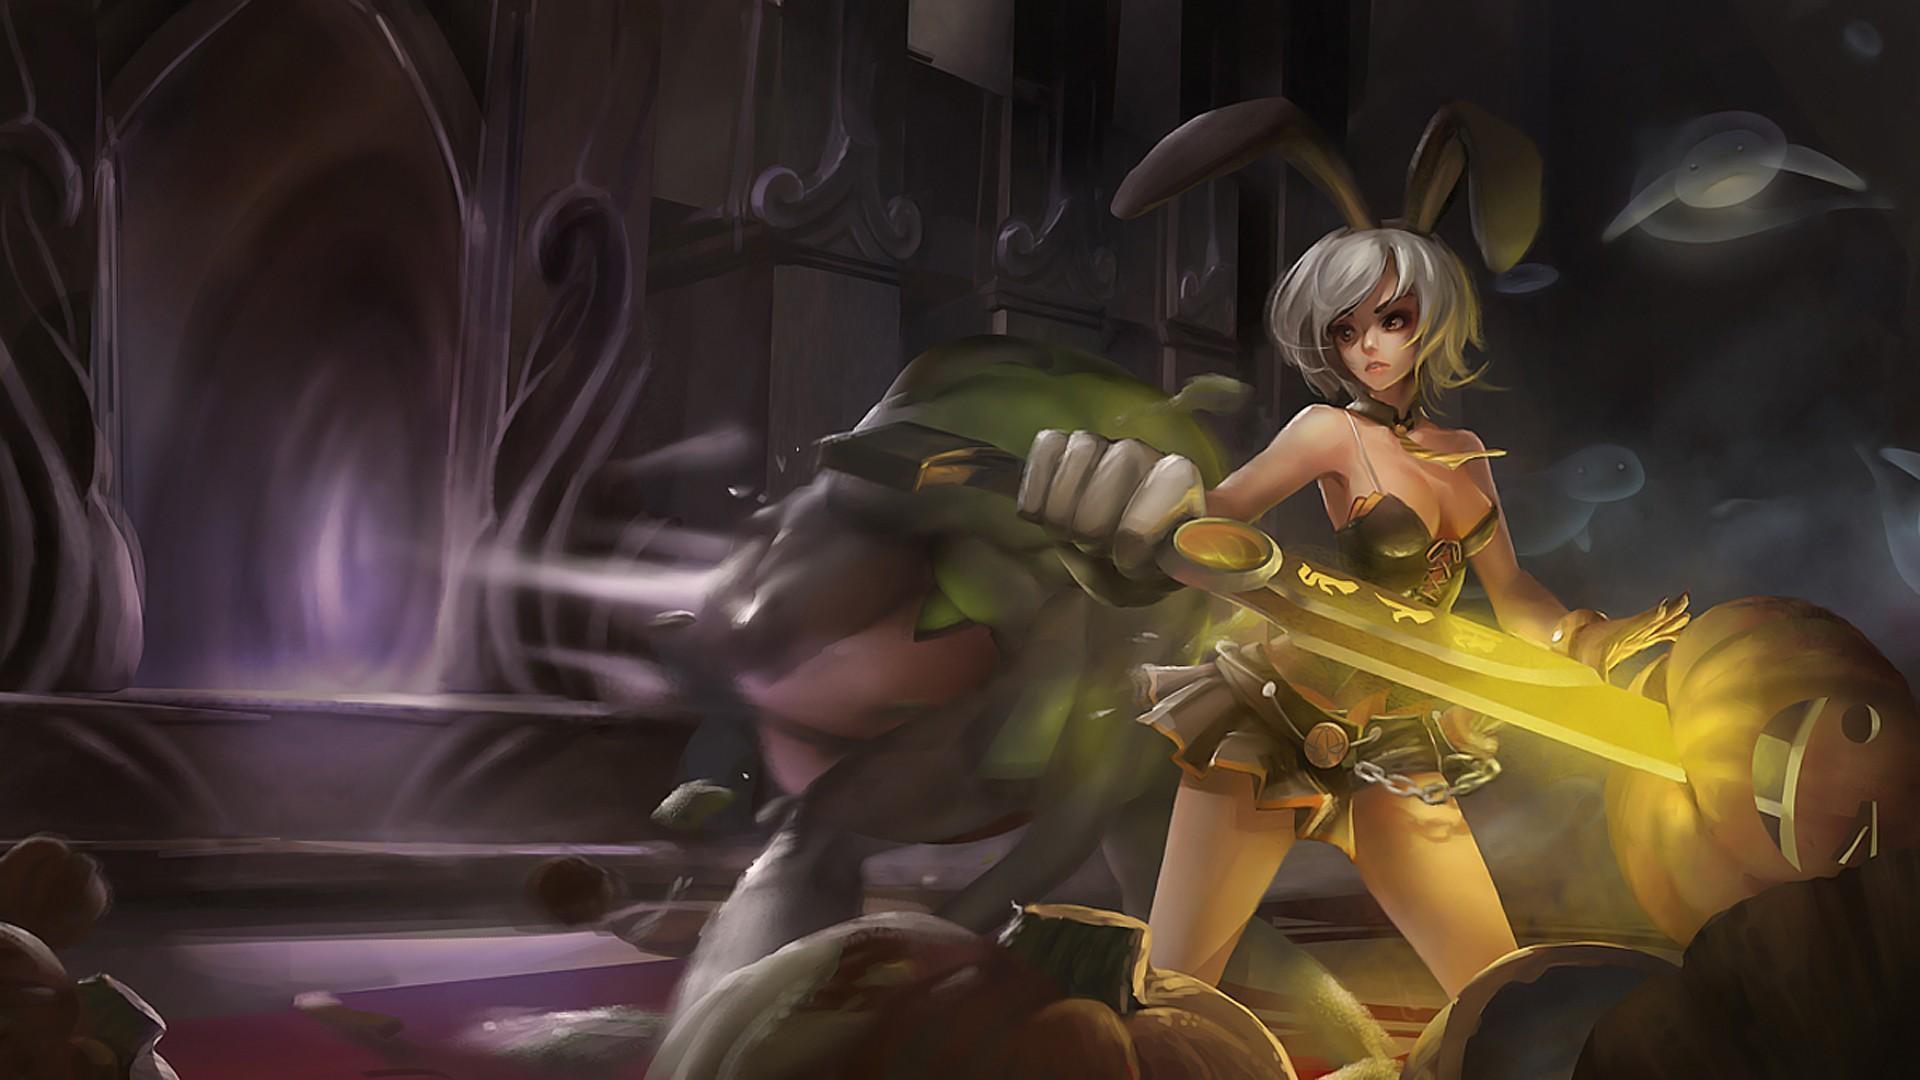 Wallpaper Video Games Anime League Of Legends Riven